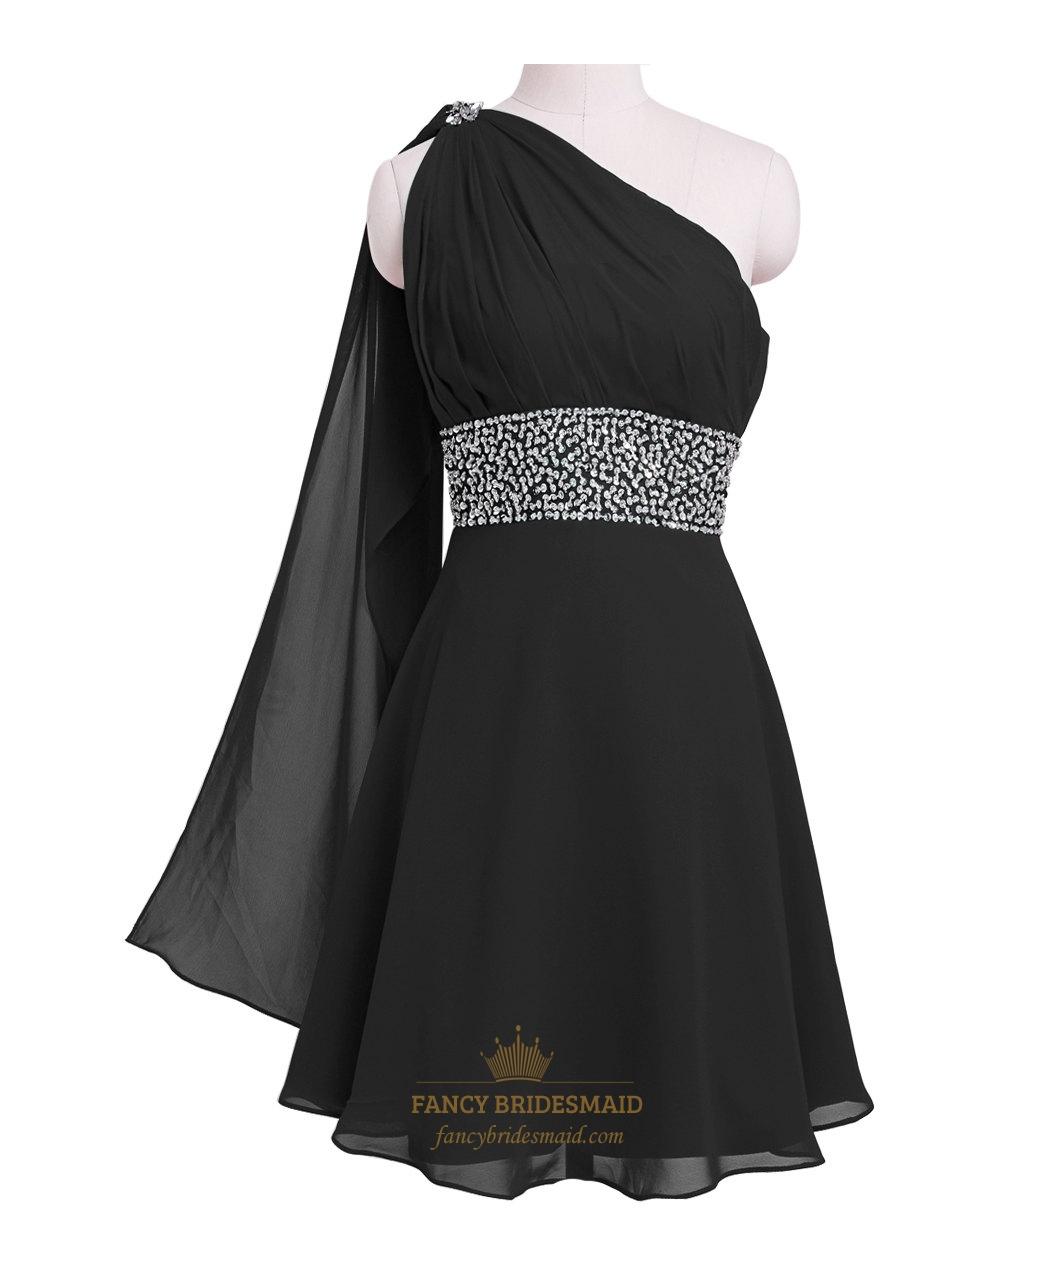 b05add07169 Little Black Short One Shoulder Chiffon Cocktail Dress With Beaded Waist  SKU -NW605